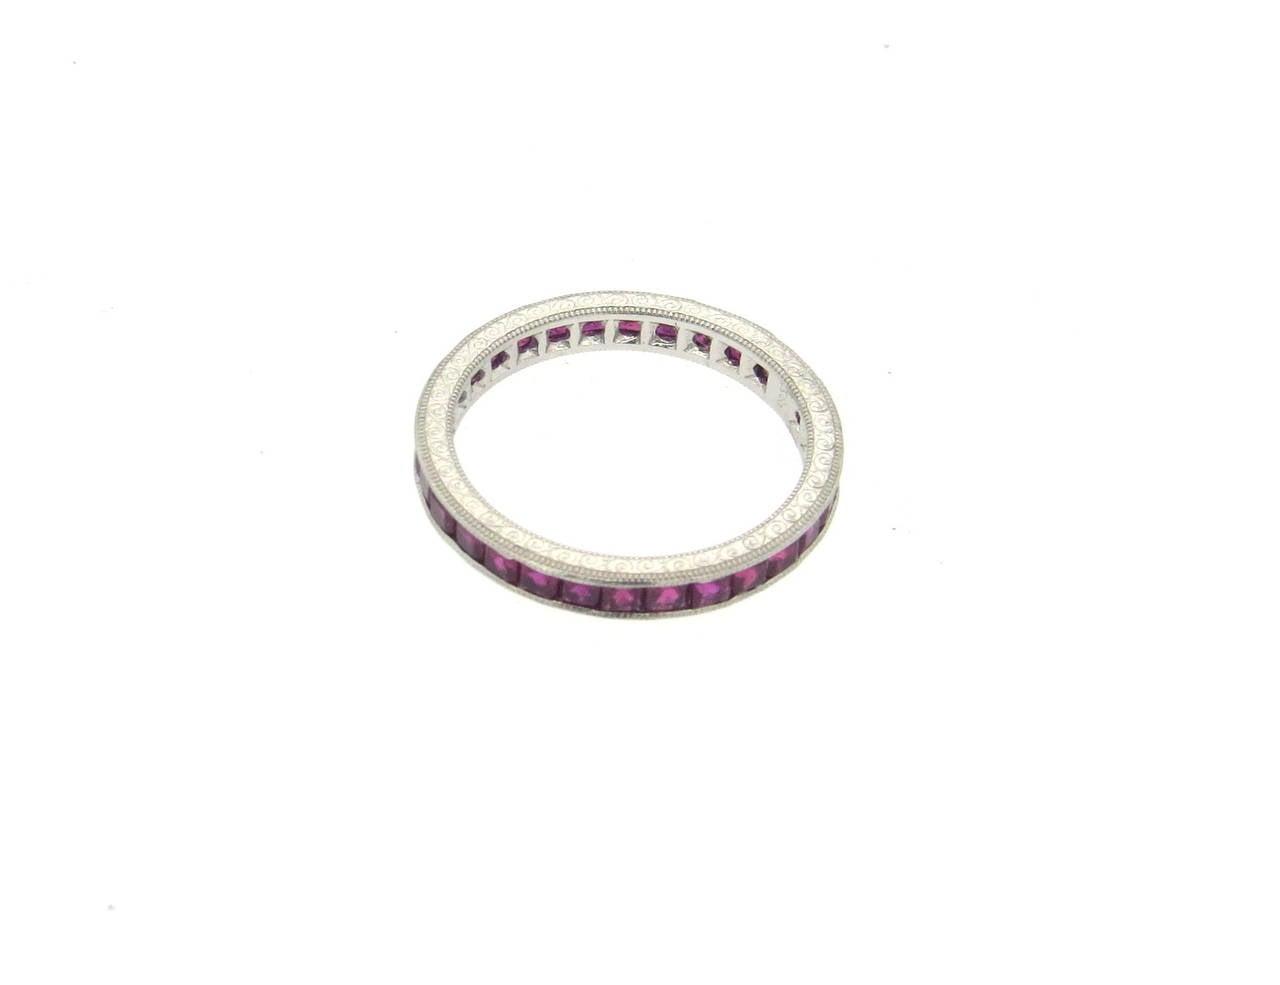 ruby platinum eternity wedding band ring at 1stdibs